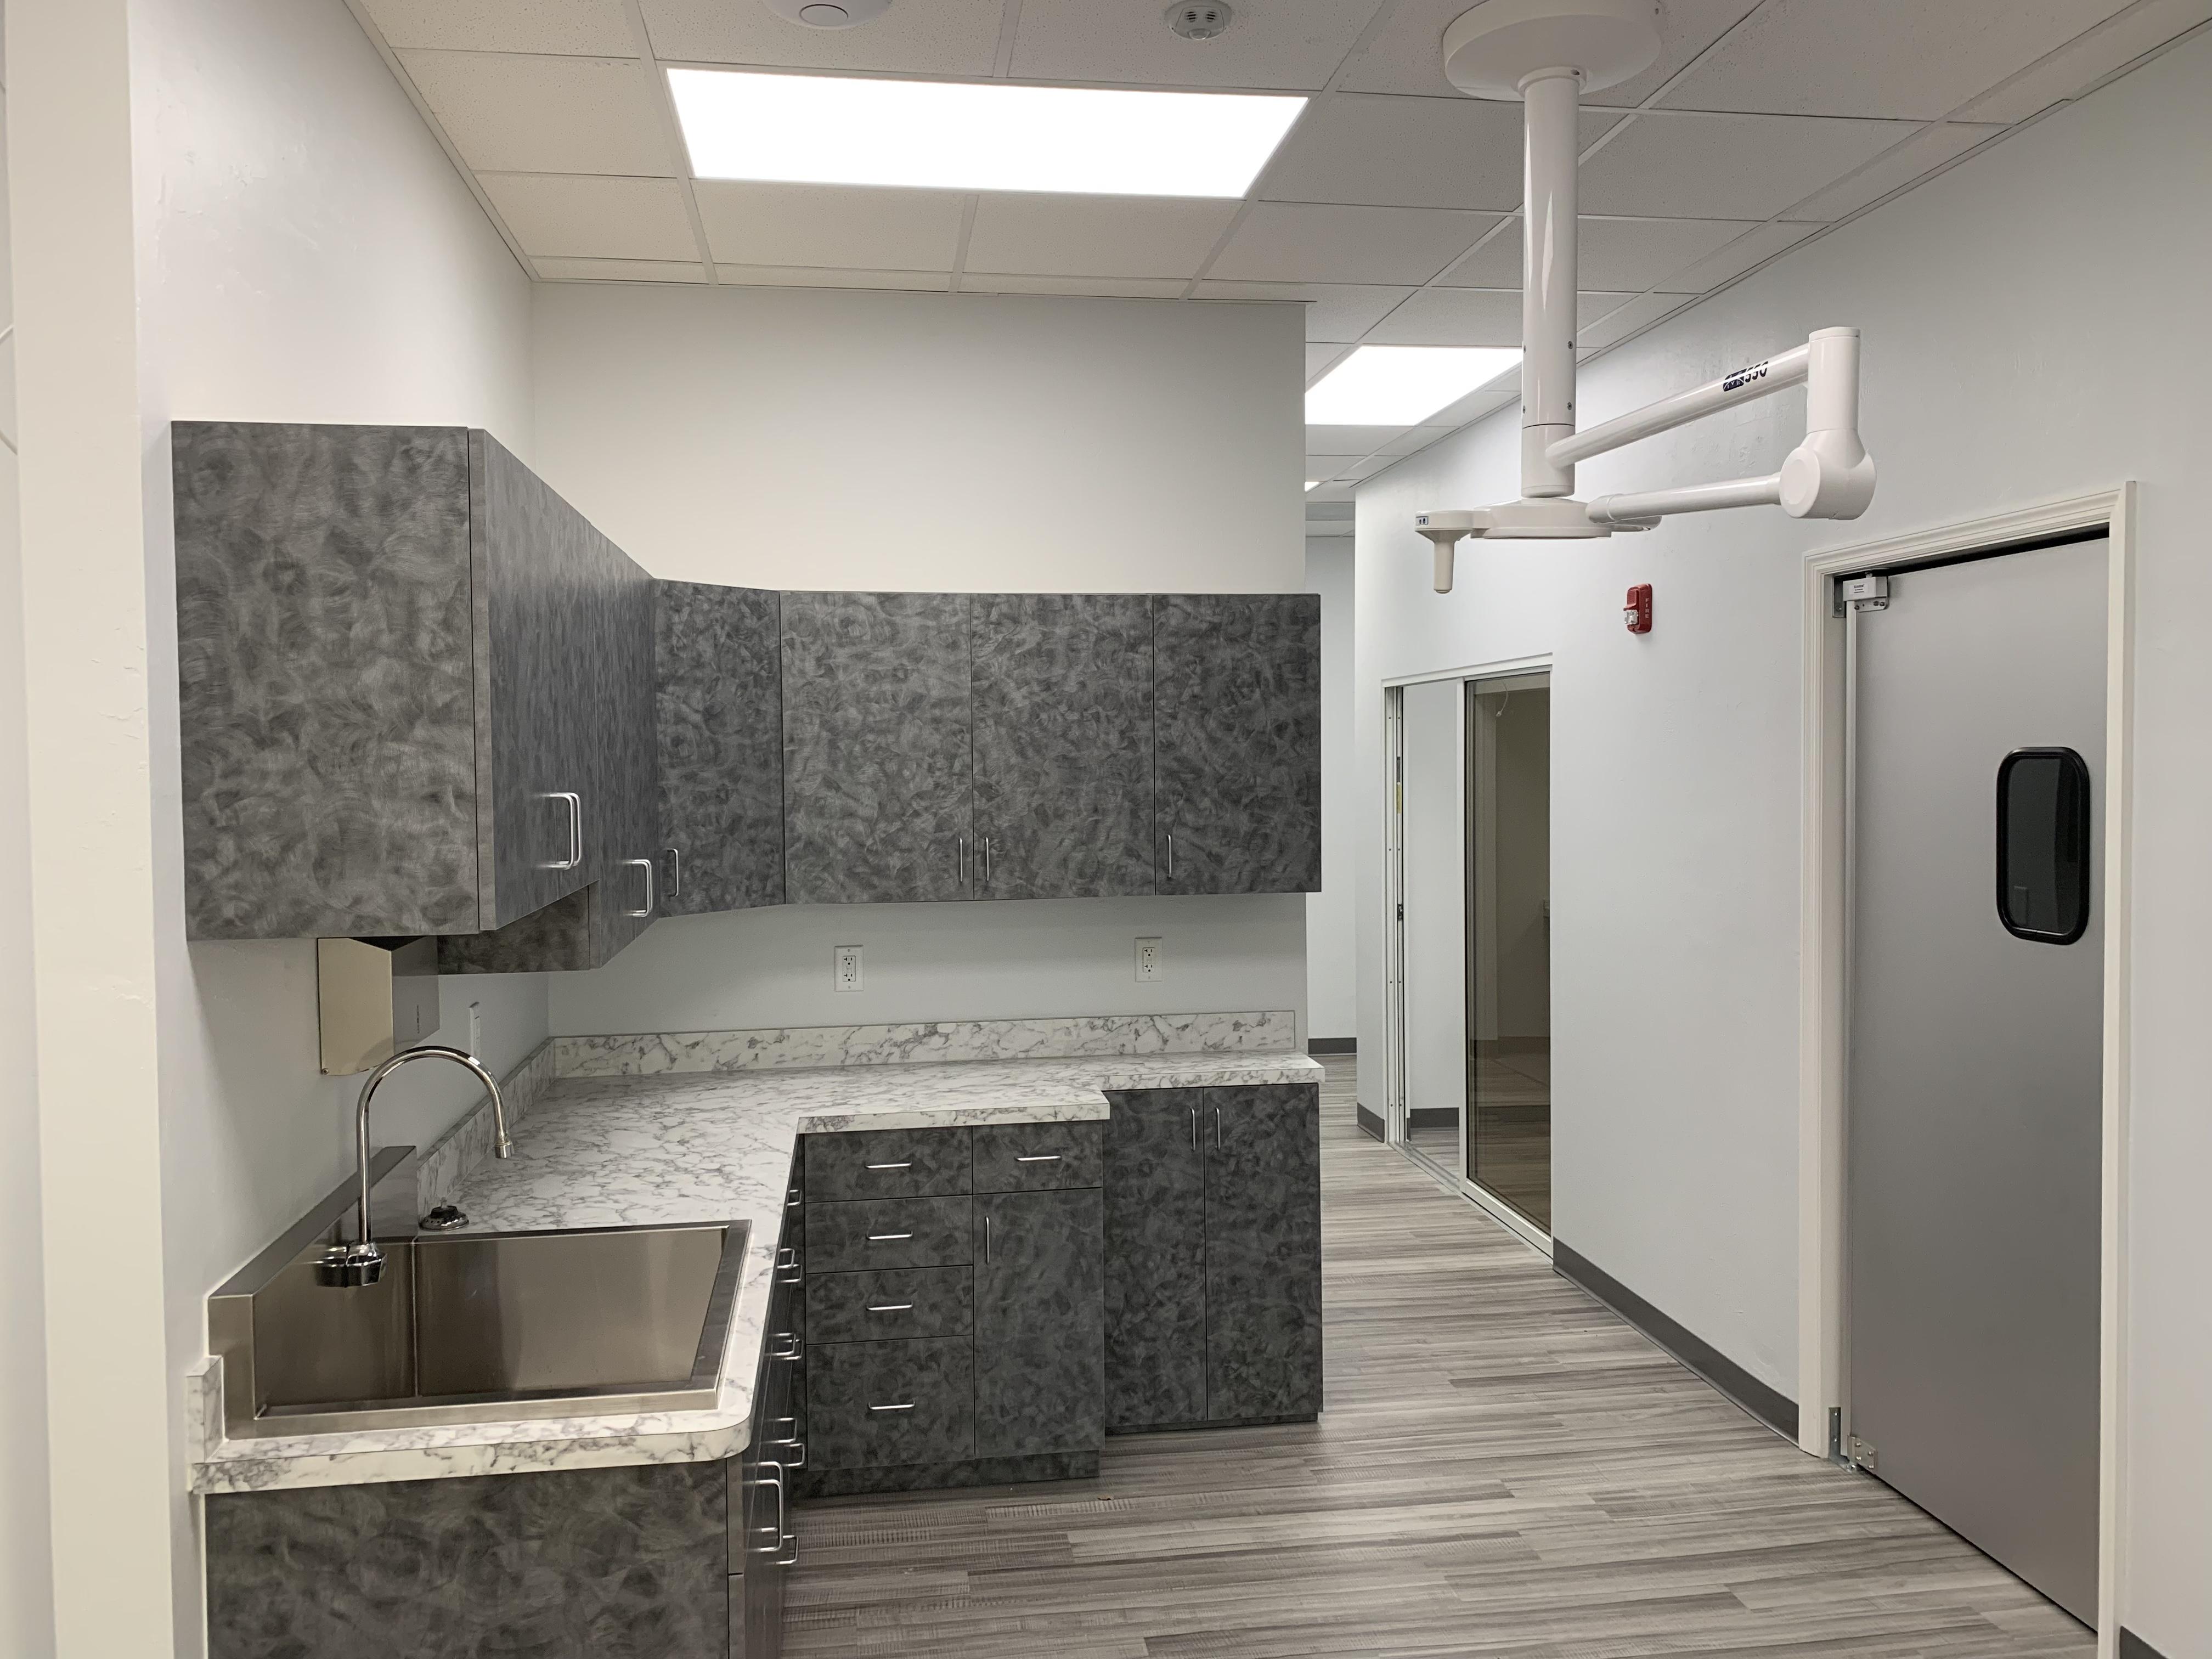 Vet Clinic - Prep Area 01.22.2019